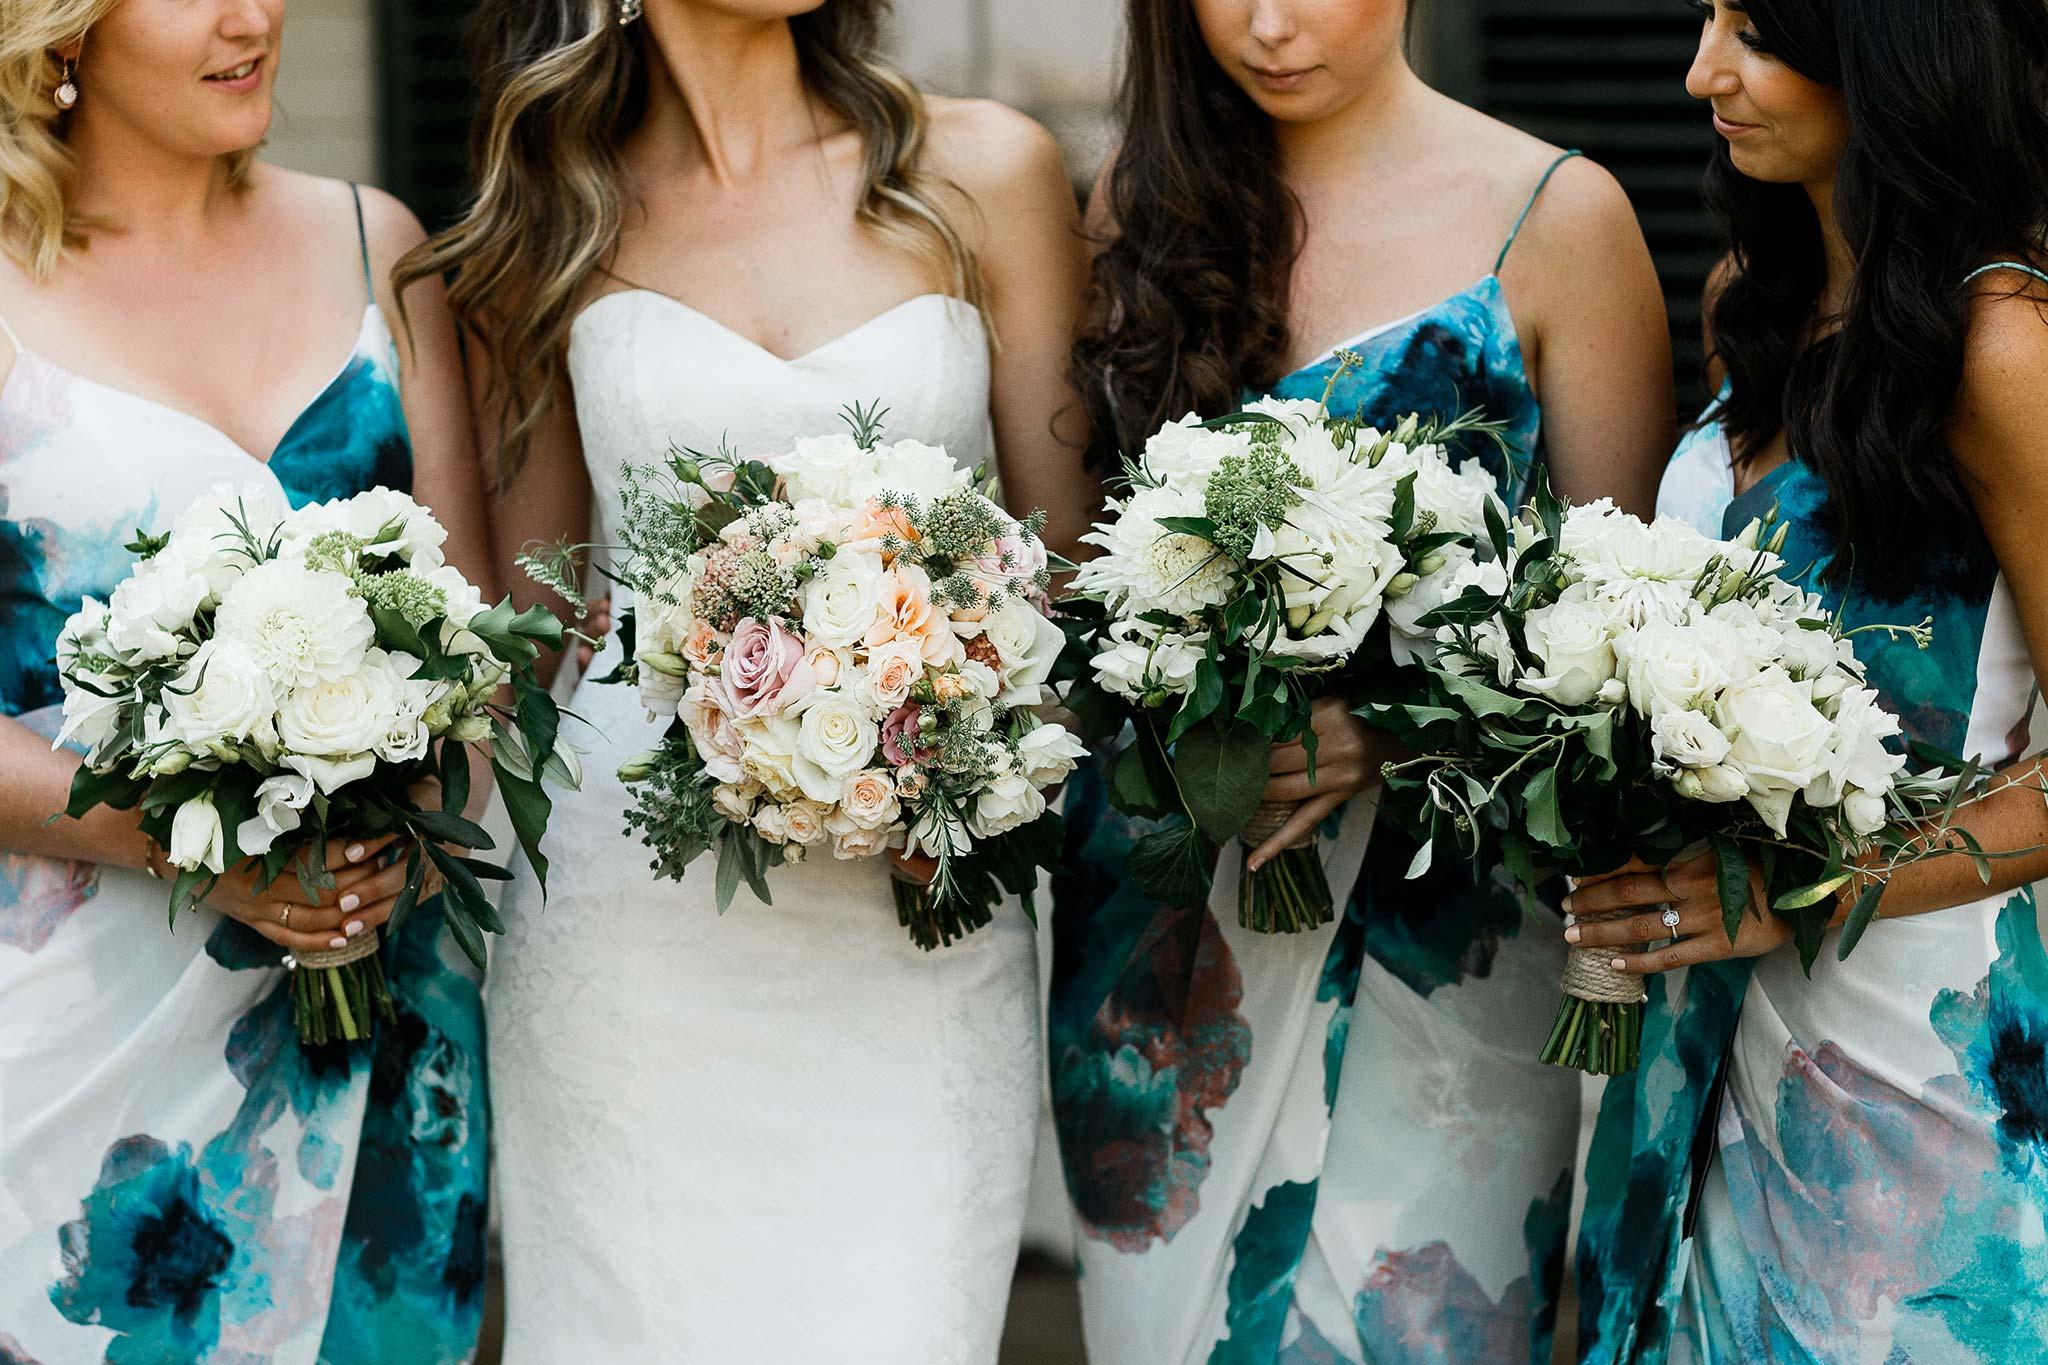 Launceston-Brickendon-Wedding-Photographer-bouquets